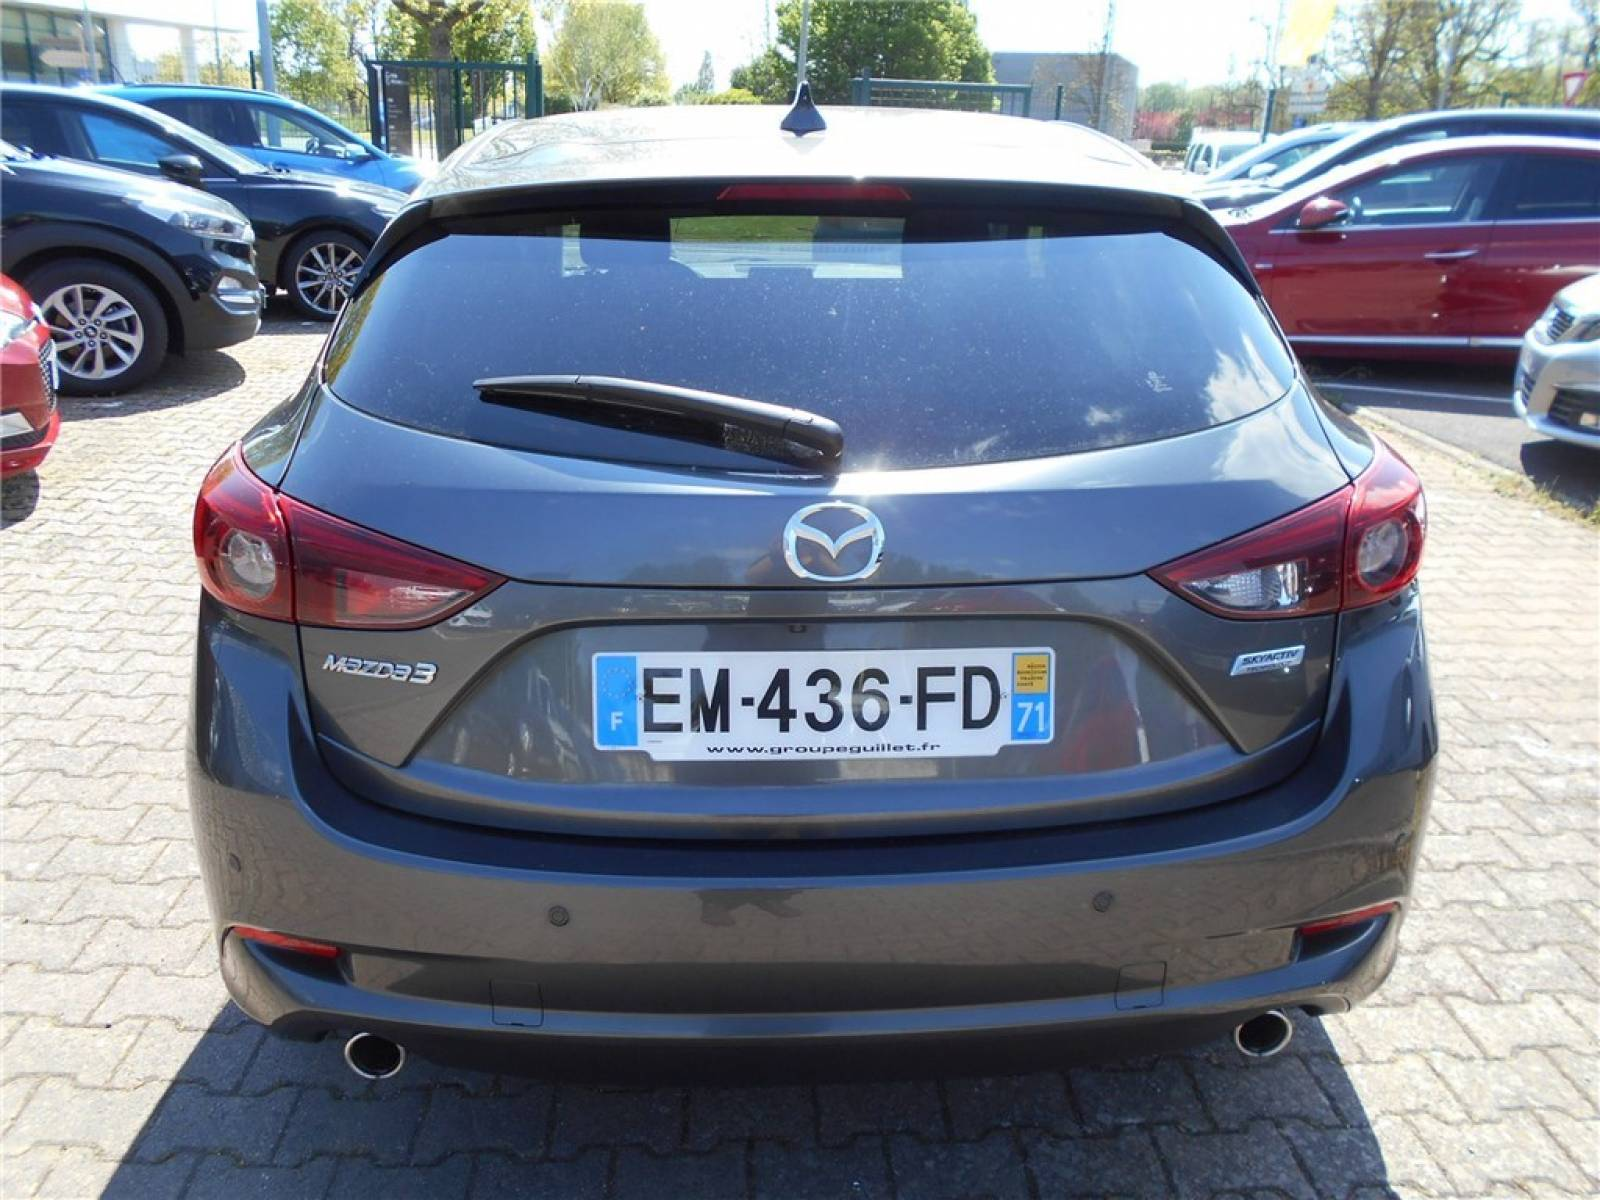 MAZDA Mazda3 2.2L SKYACTIV-D 150ch - véhicule d'occasion - Groupe Guillet - Chalon Automobiles - 71100 - Chalon-sur-Saône - 31